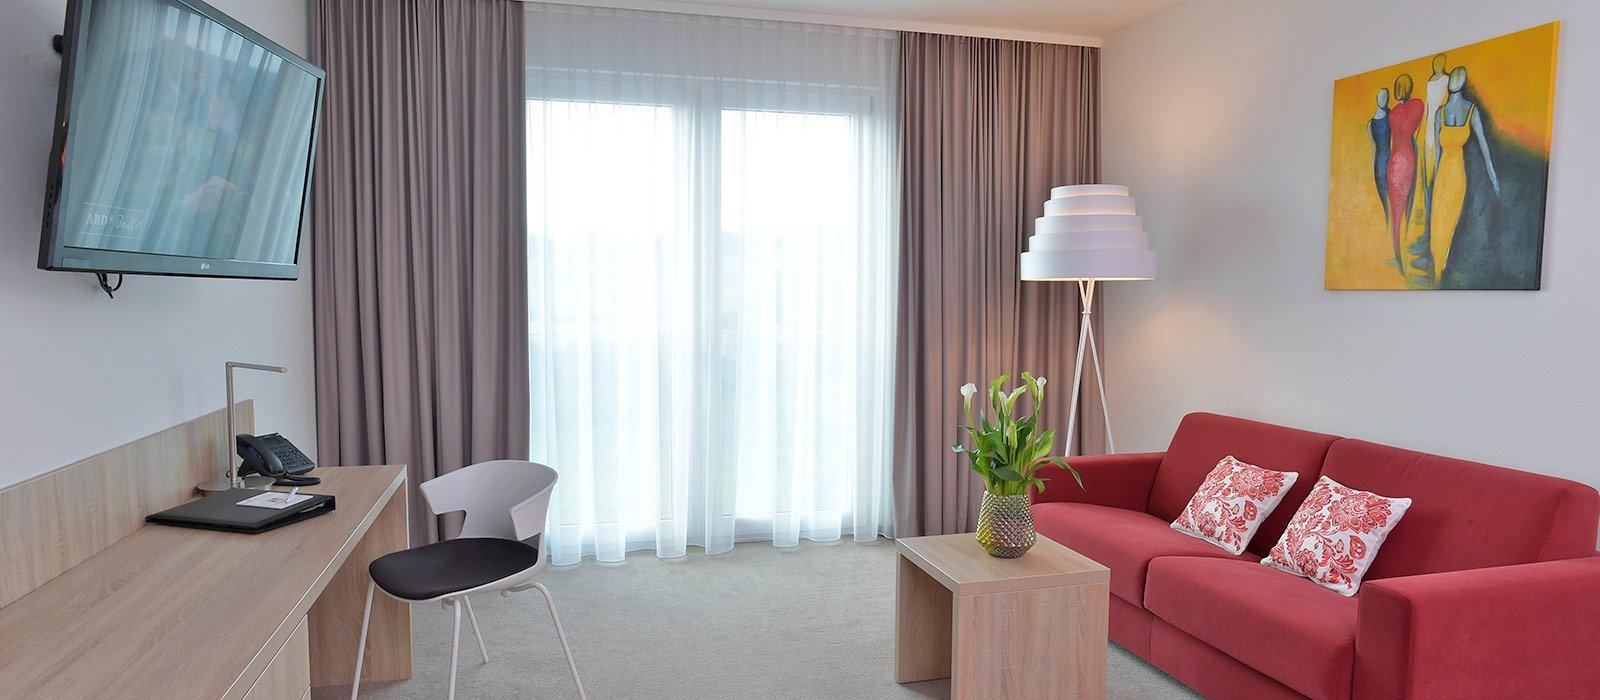 Longstay Apartments